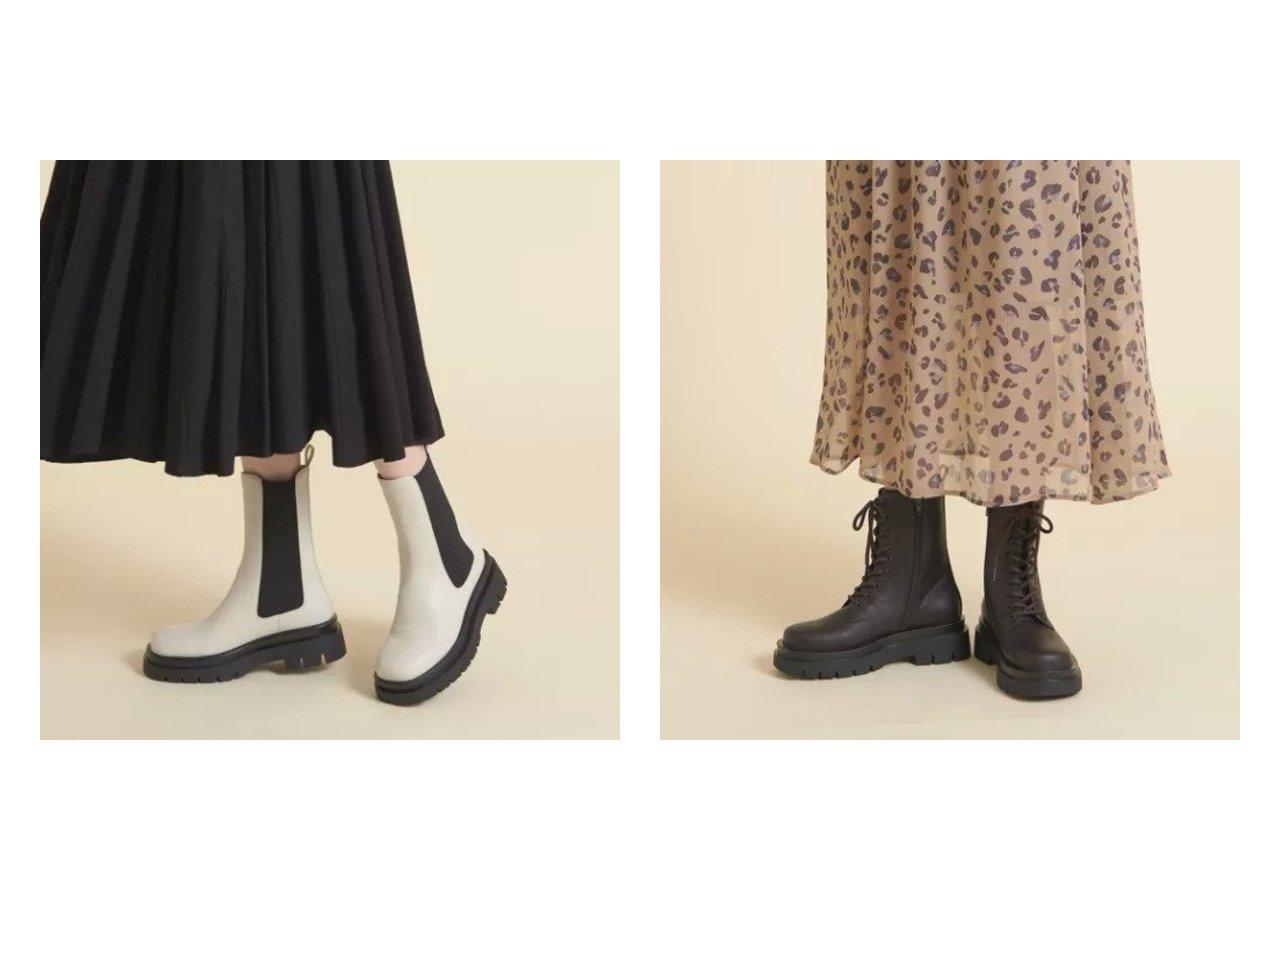 【Odette e Odile/オデット エ オディール】の【WEB限定】サイドゴア ショートブーツ55●↑&【WEB限定】レースアップ ショートブーツ55●↑ 【シューズ・靴】おすすめ!人気、トレンド・レディースファッションの通販 おすすめで人気の流行・トレンド、ファッションの通販商品 インテリア・家具・メンズファッション・キッズファッション・レディースファッション・服の通販 founy(ファニー) https://founy.com/ ファッション Fashion レディースファッション WOMEN 厚底 シューズ ショート ソックス フェミニン レース おすすめ Recommend |ID:crp329100000072580